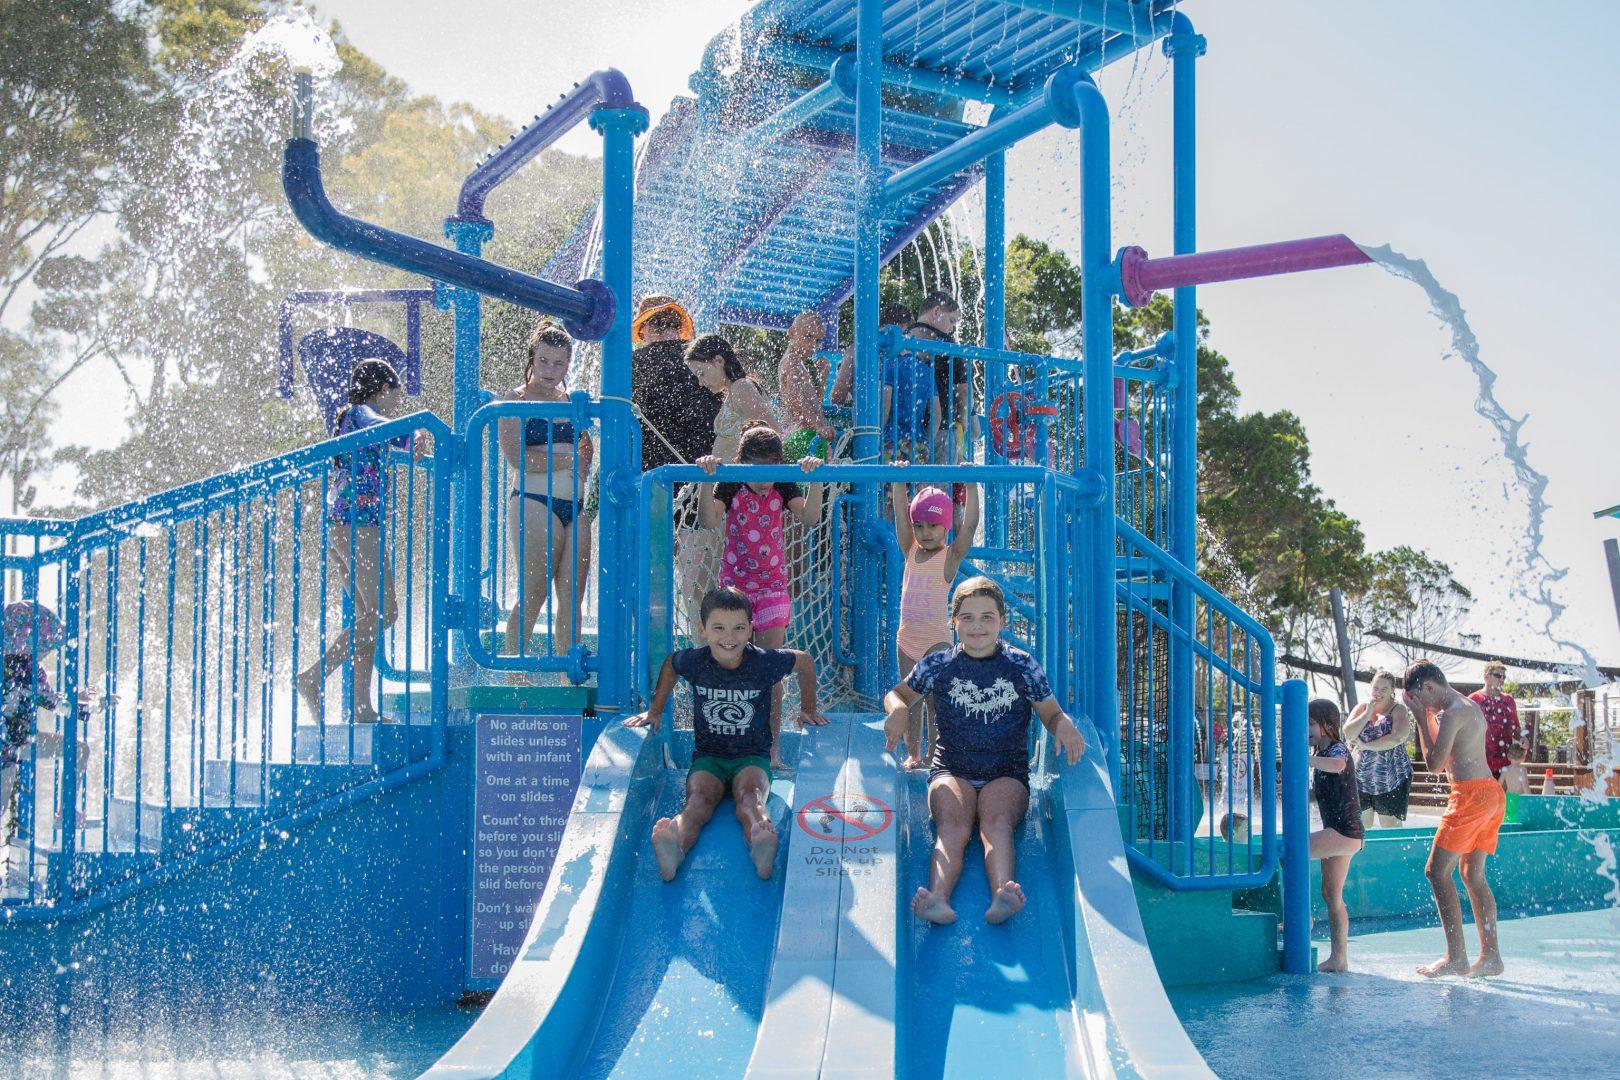 SplashSide and WetSide re-opening this week